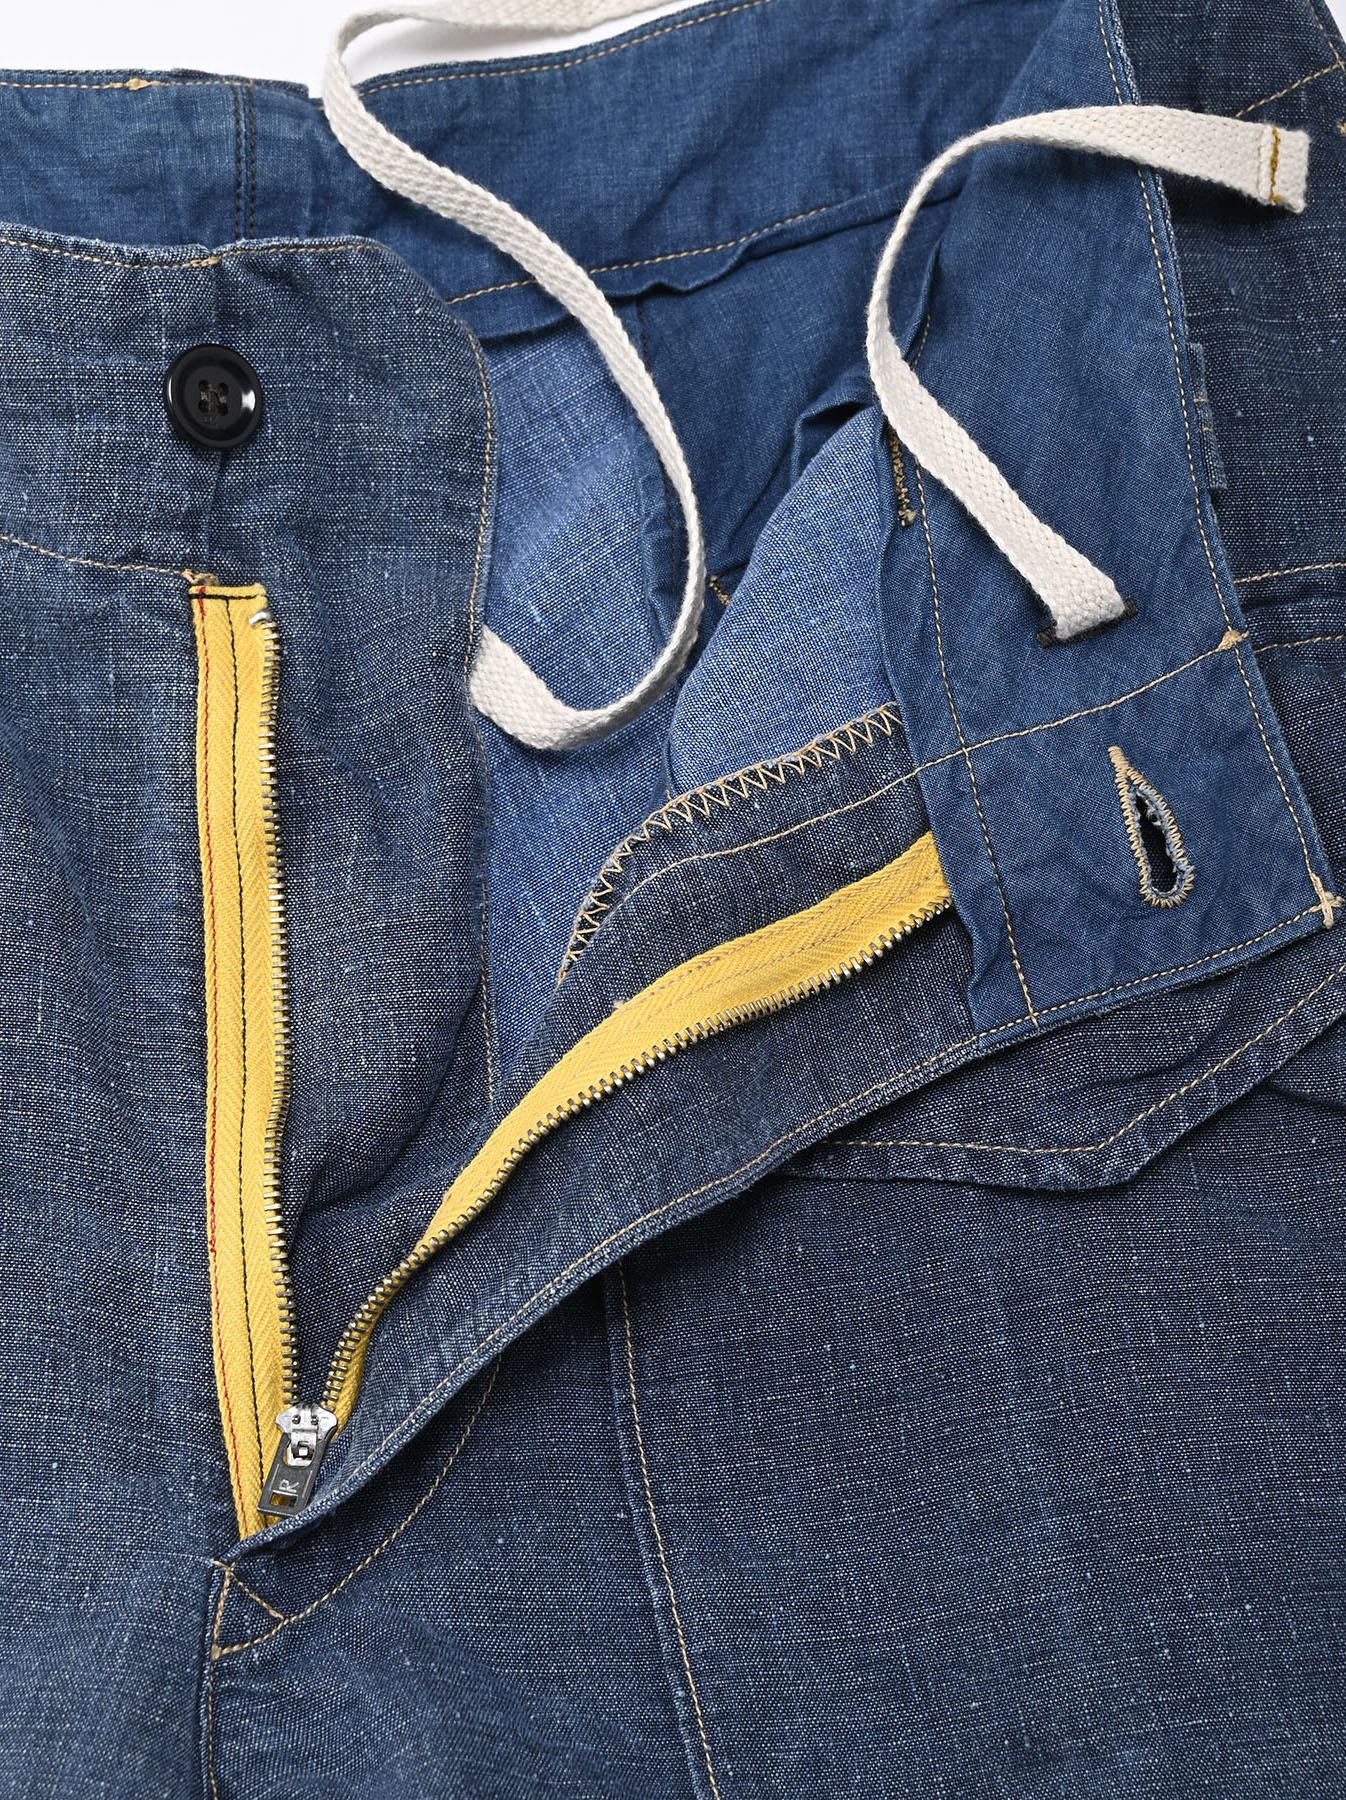 Indigo Linen 908 Easy Sail Shorts Distressed (0721)-6